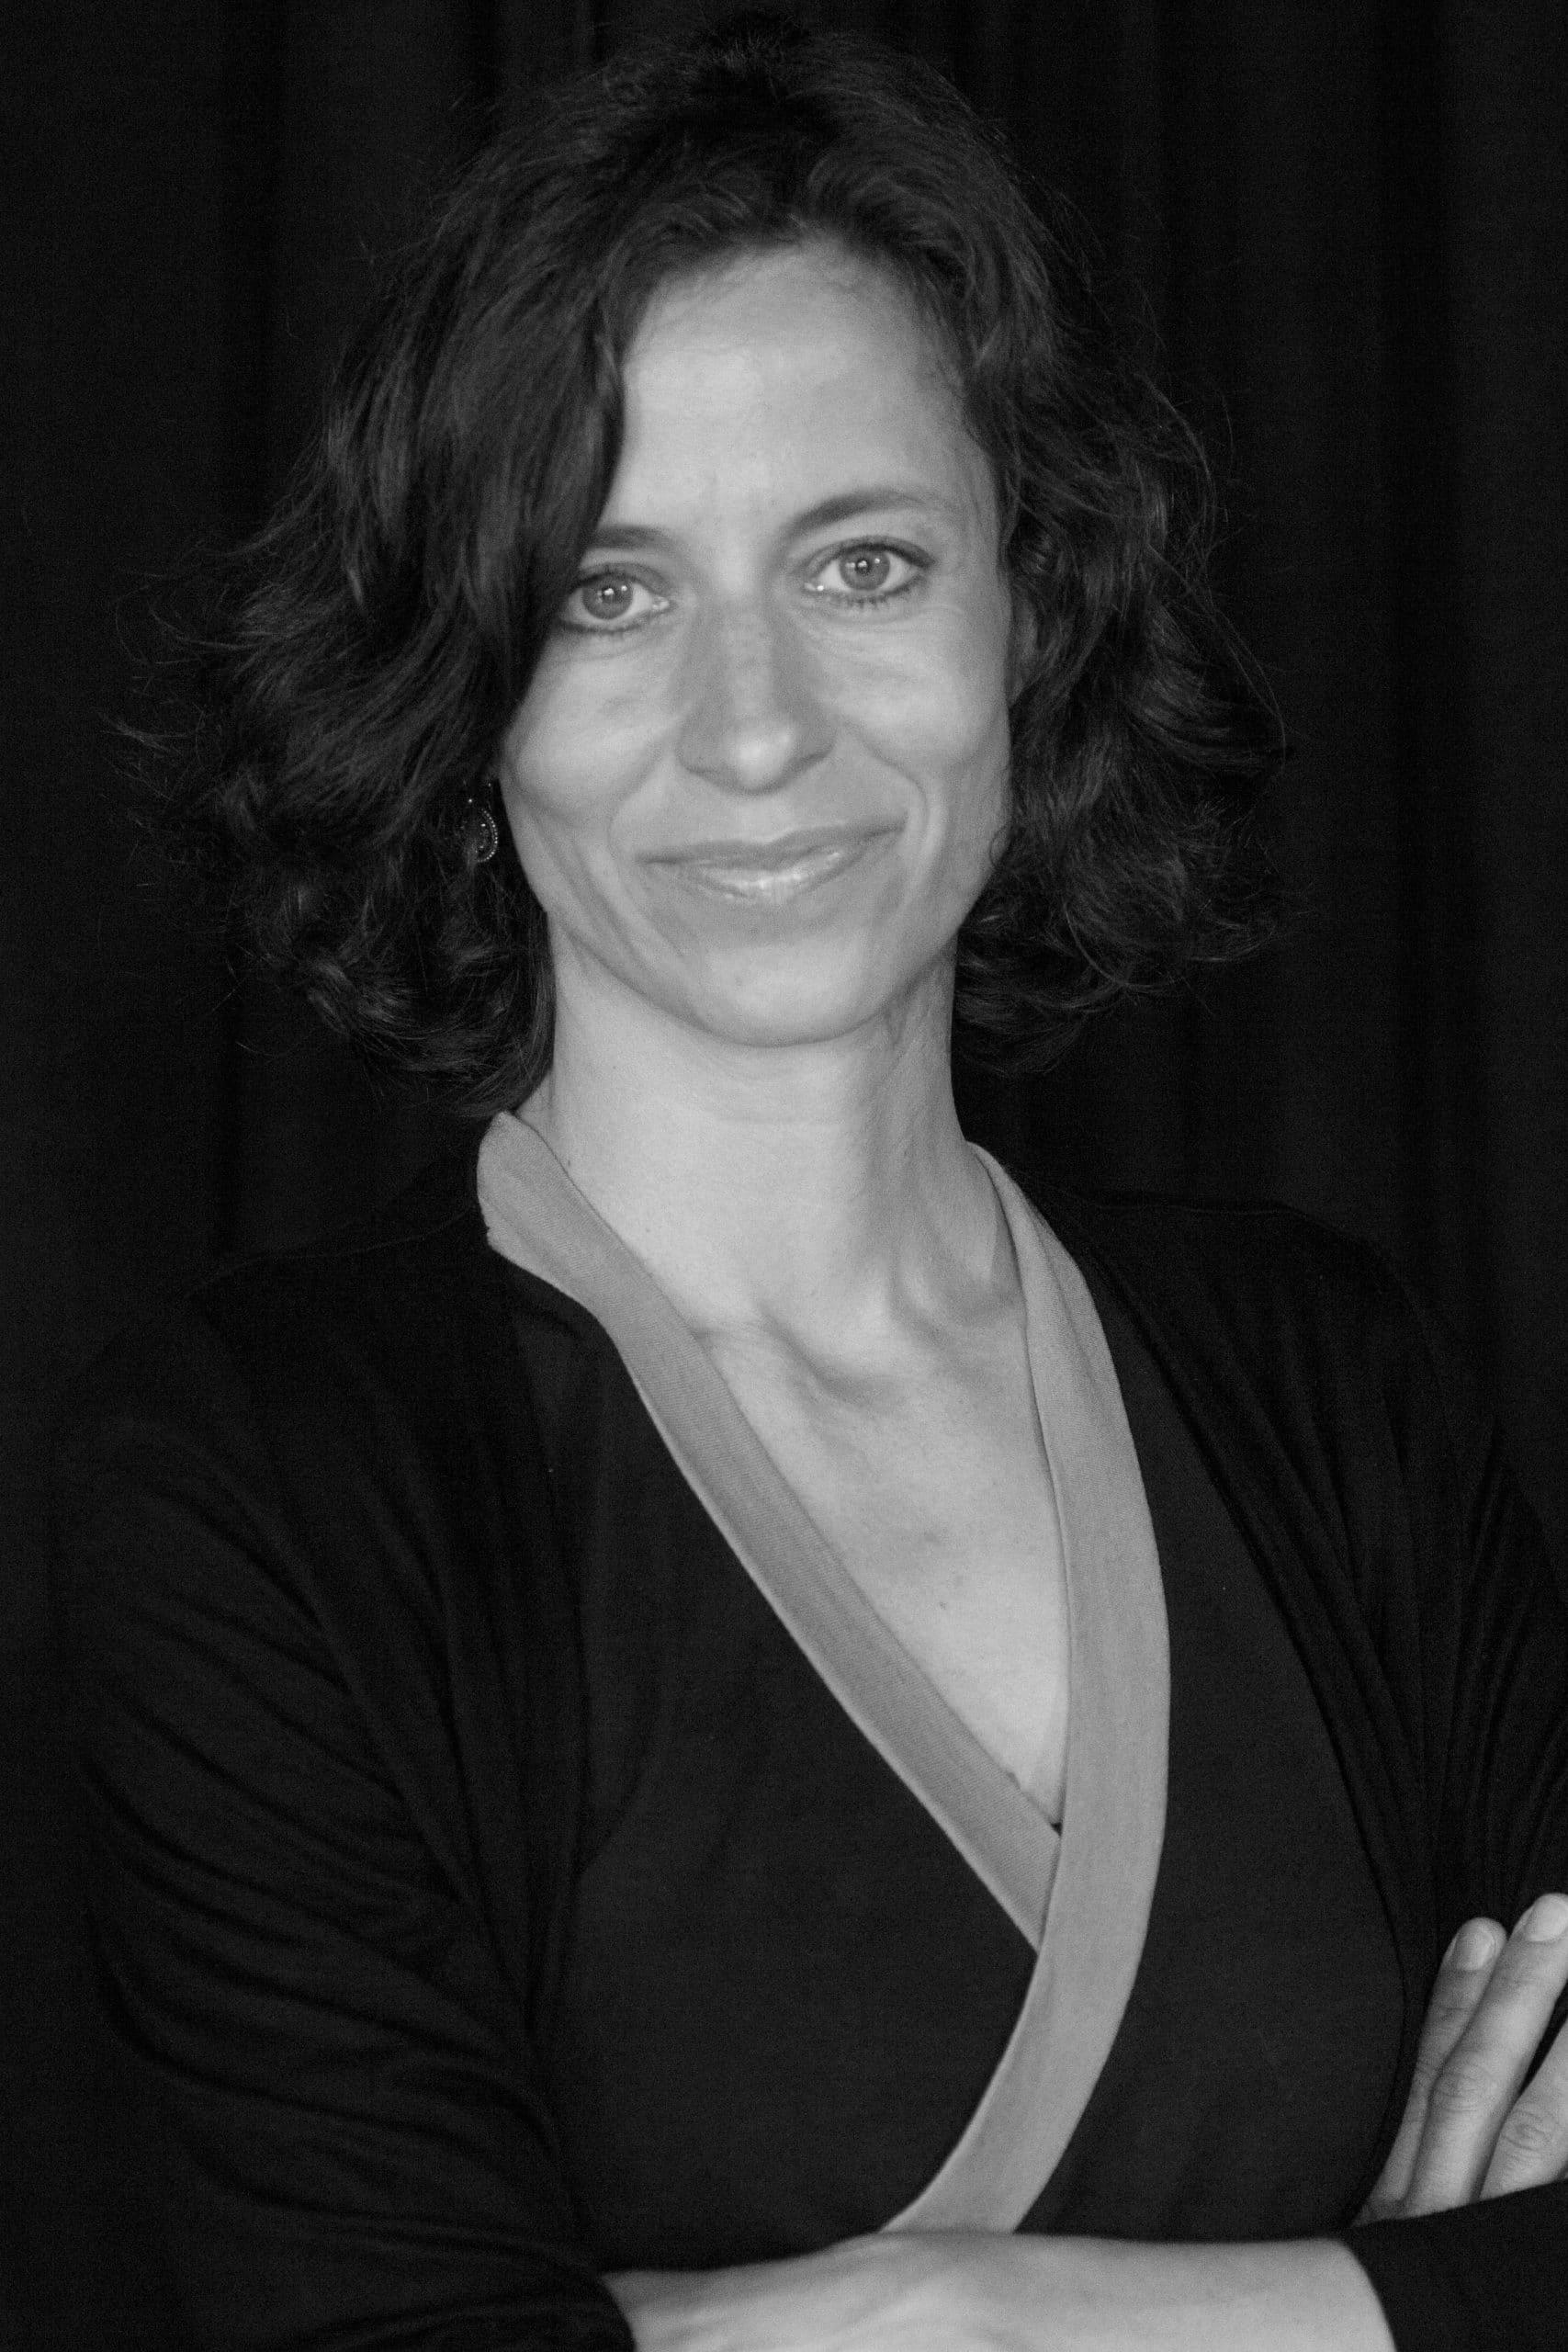 Kerstin Frey